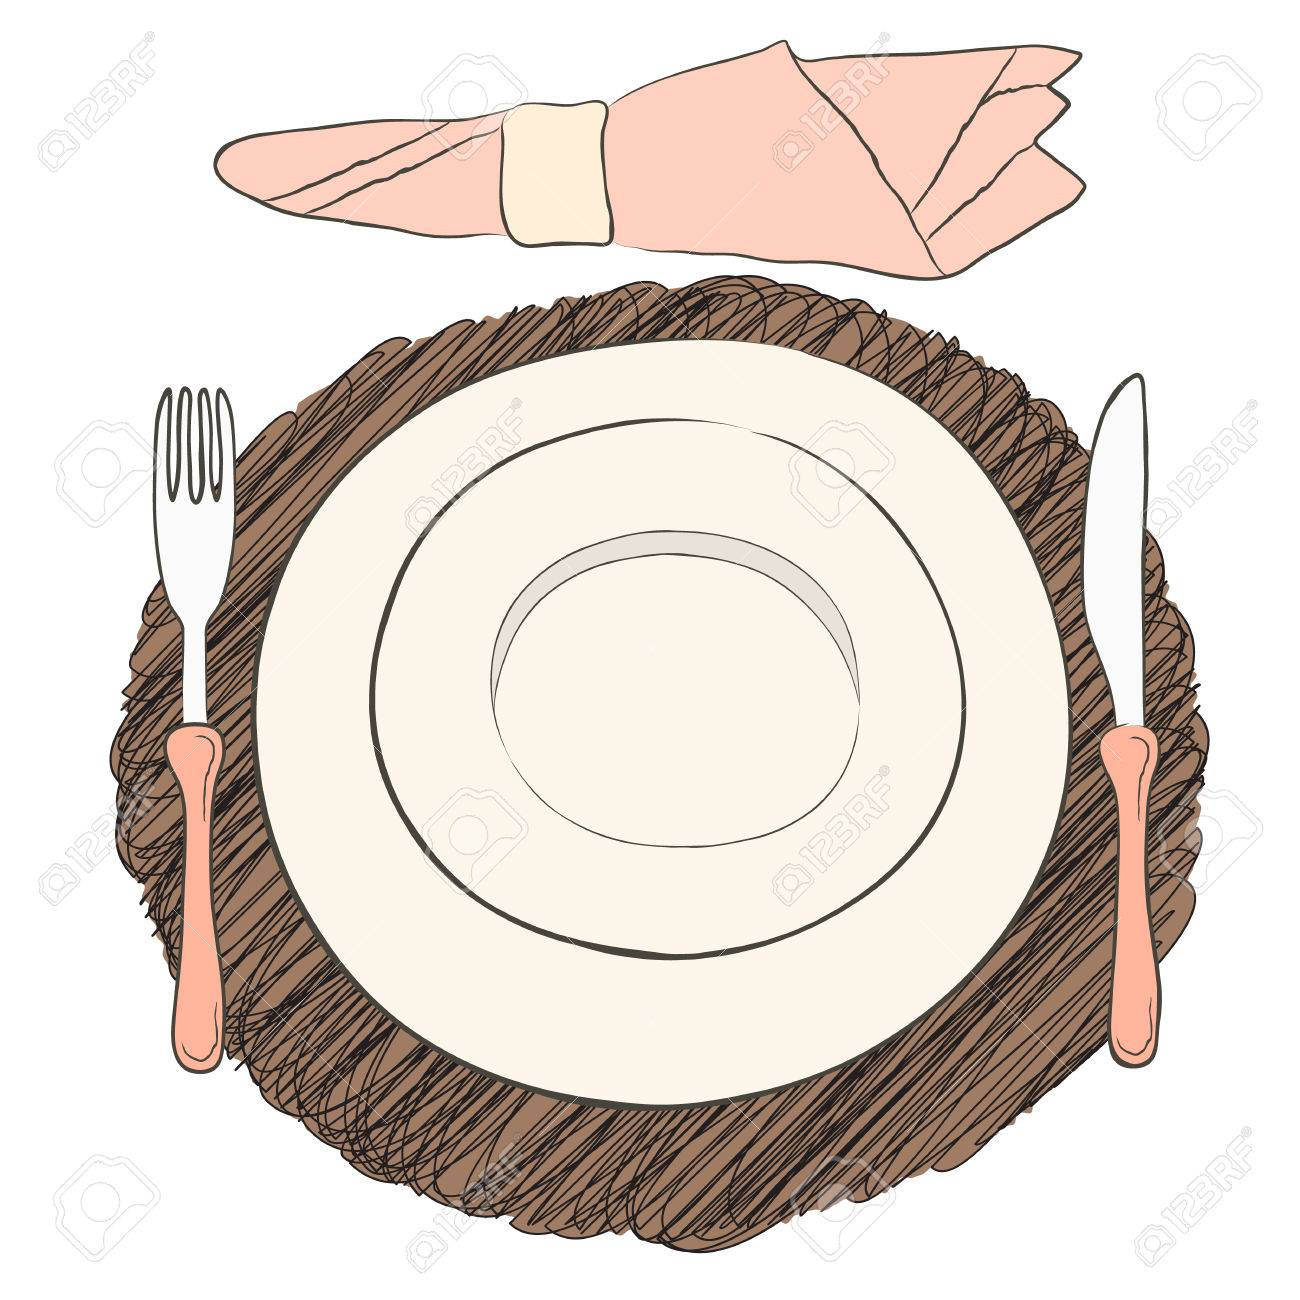 Informal Vector Table Setting. Tableware And Eating Utensils ...